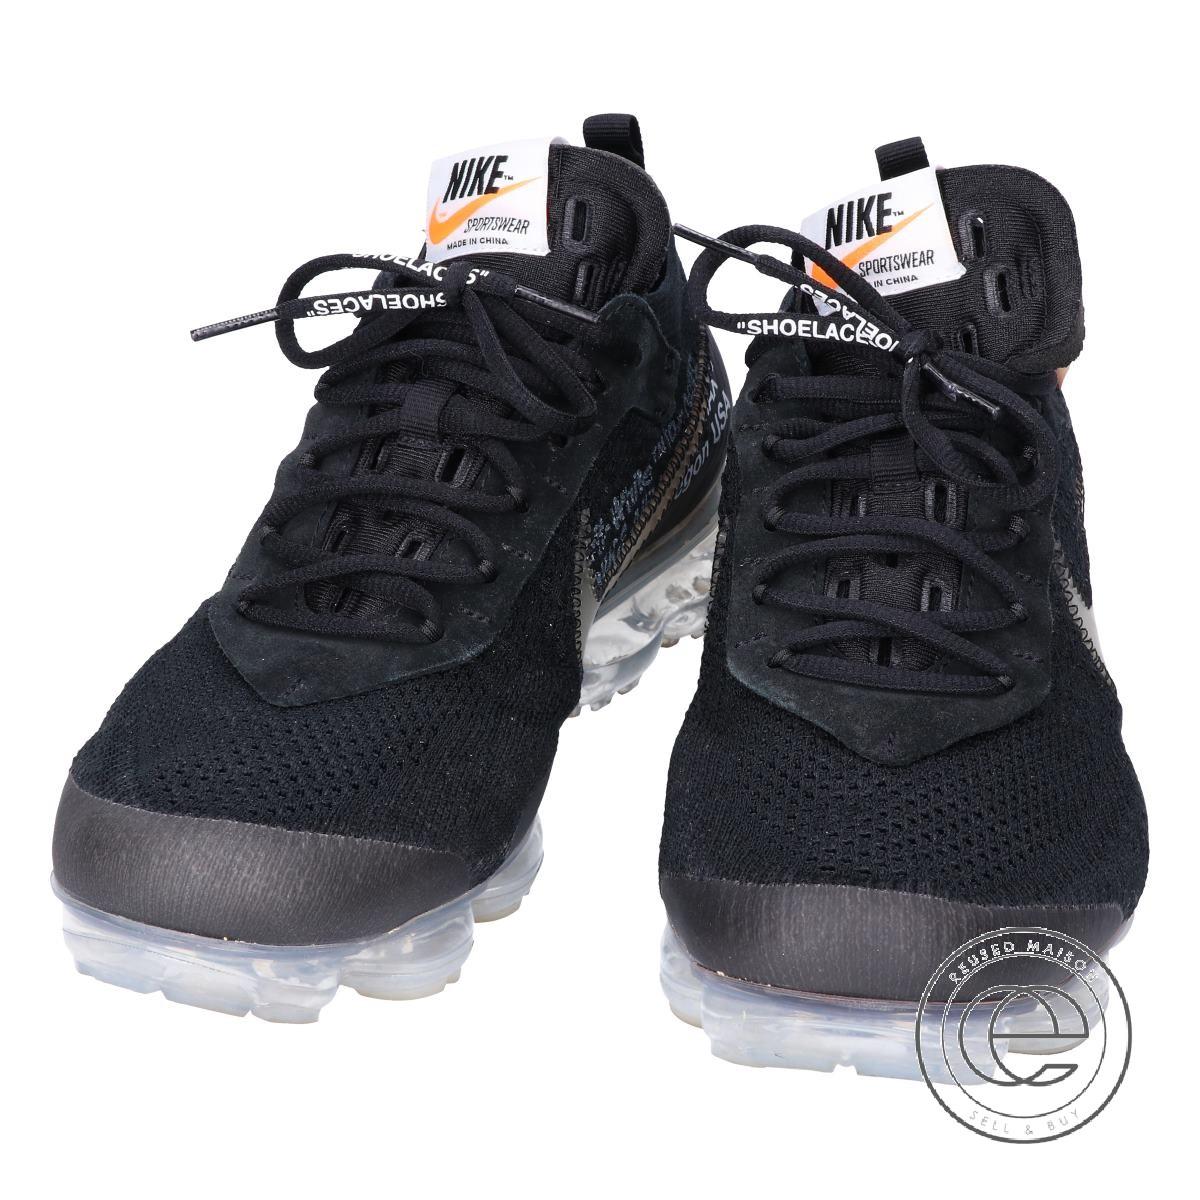 various colors de3c5 ddc45 NIKE Nike X OFF-WHITE off-white collaboration AA3831-002 THE 10 AIR  VAPORMAX FK air vapor max sneakers 28 BLACK/CLEAR-TOTAL ORANGE men